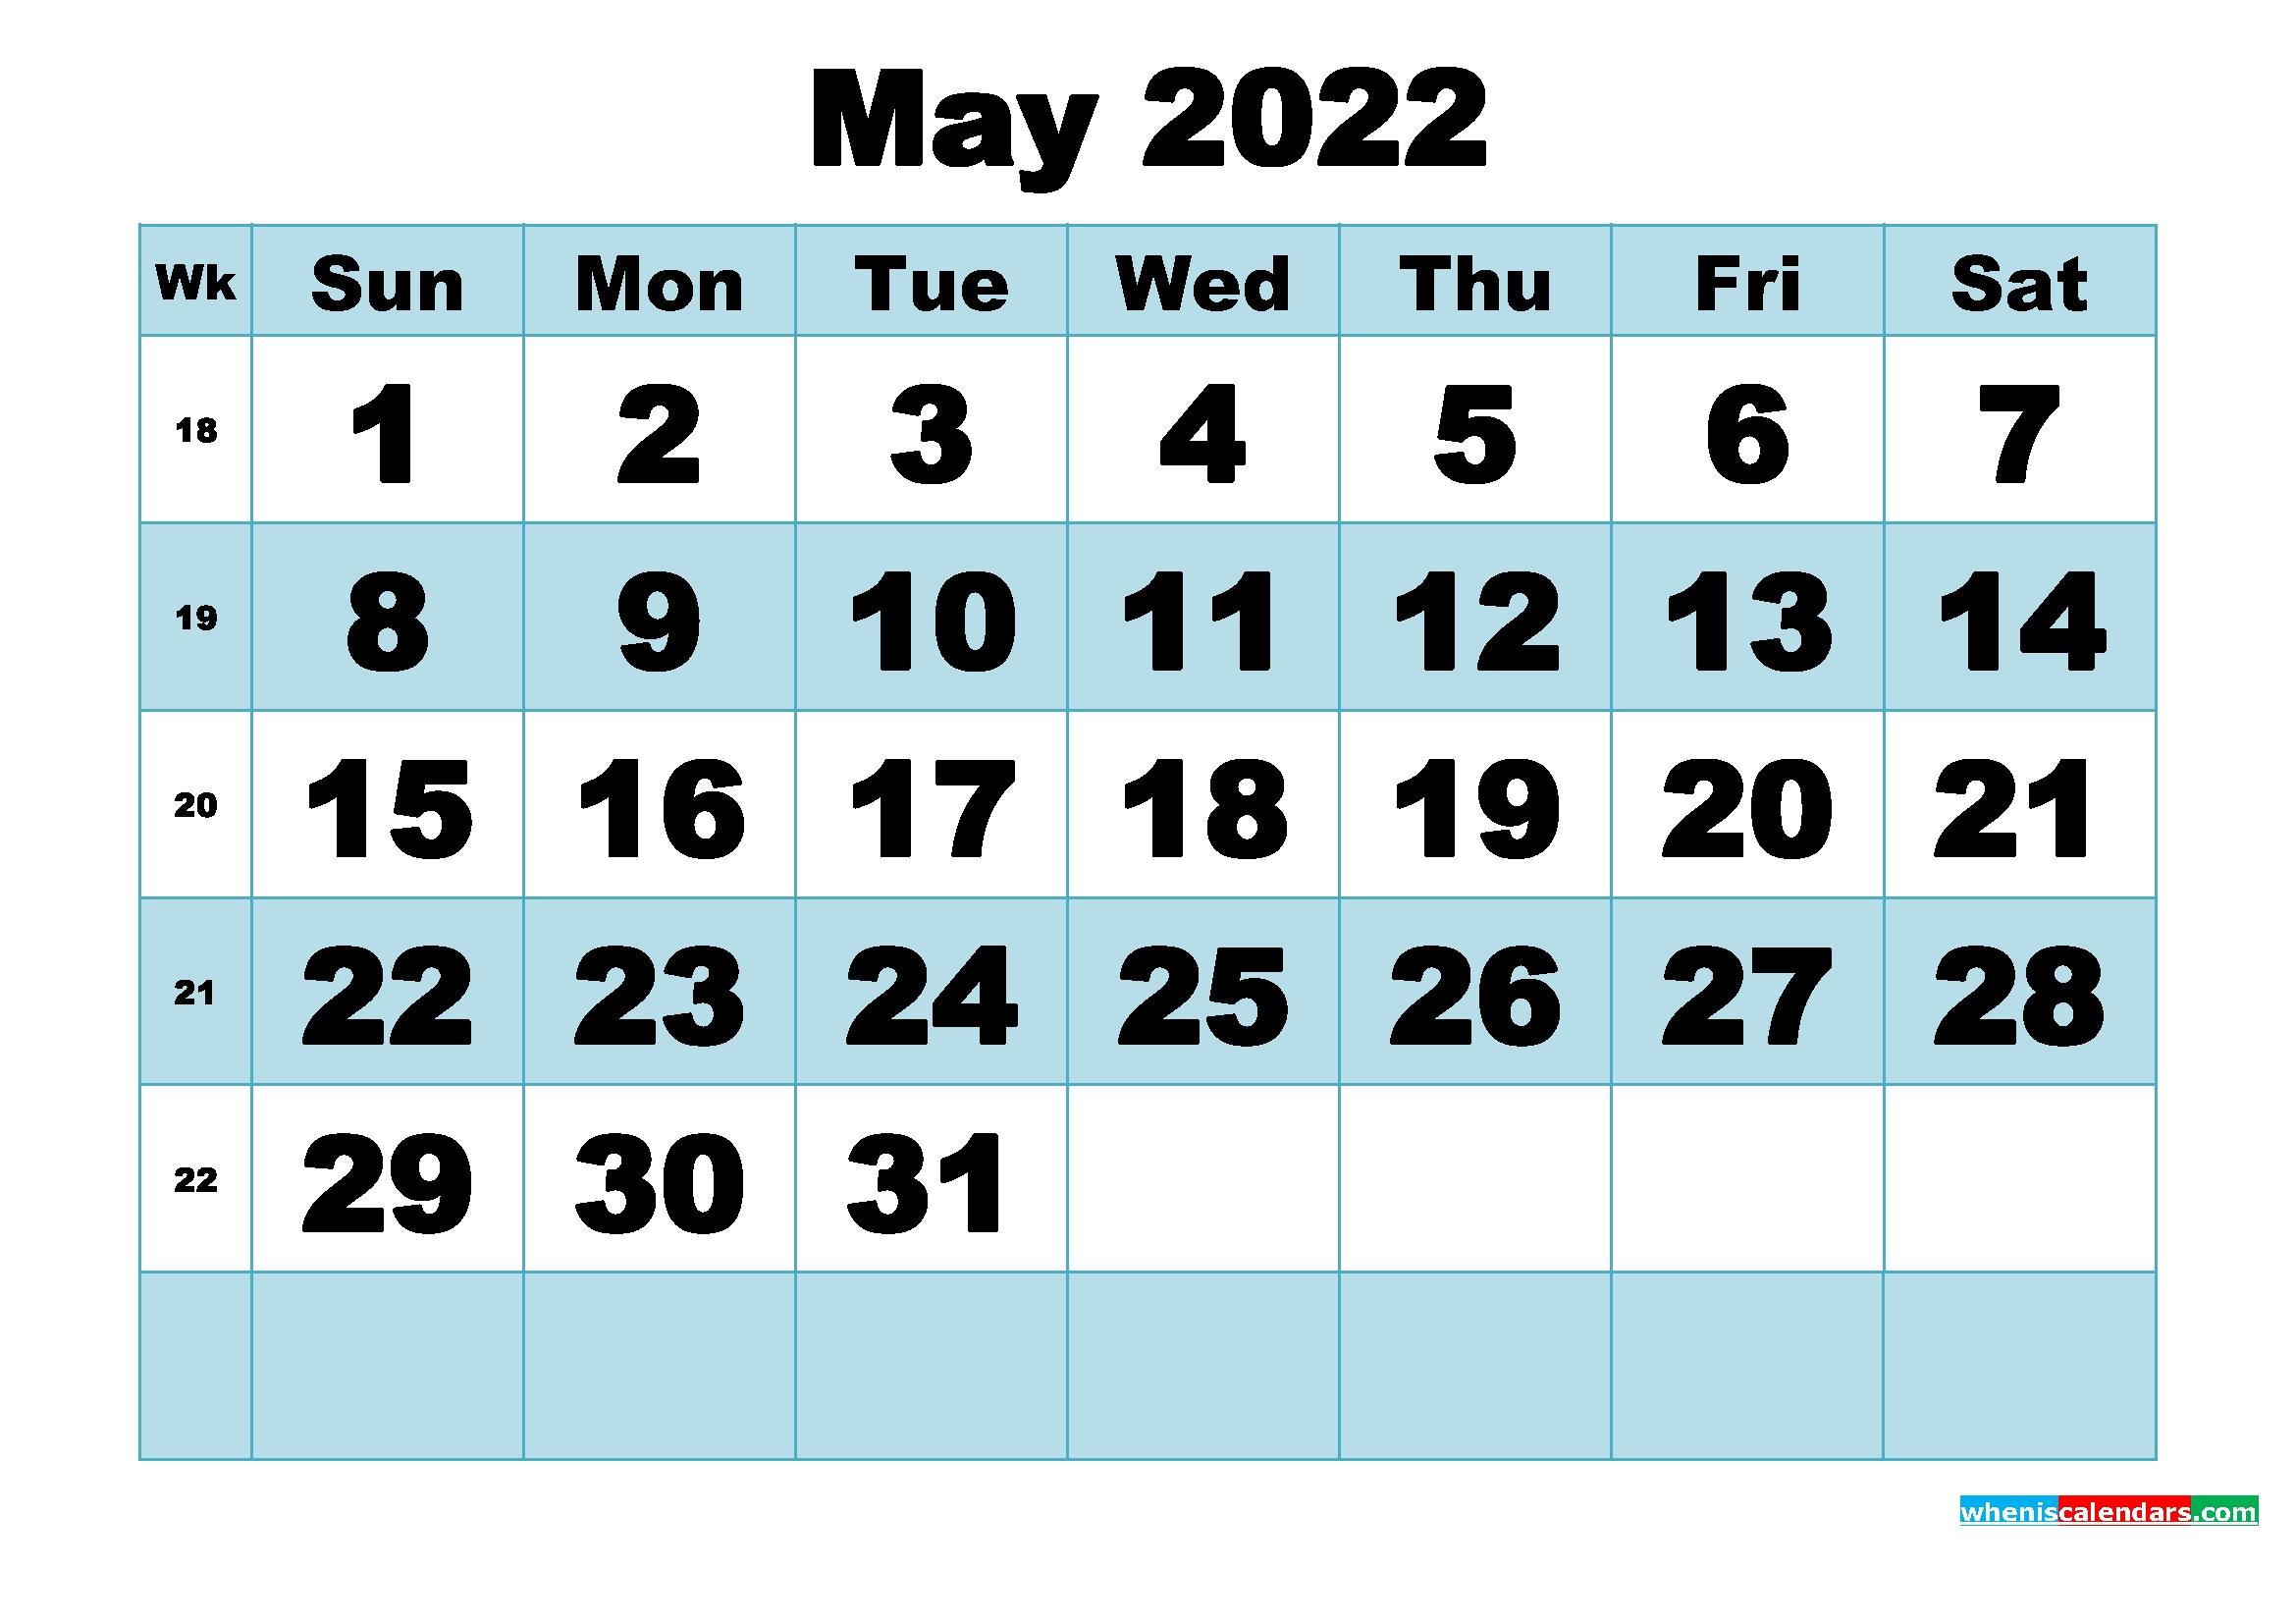 Free Printable May 2022 Calendar Word, Pdf, Image   Free